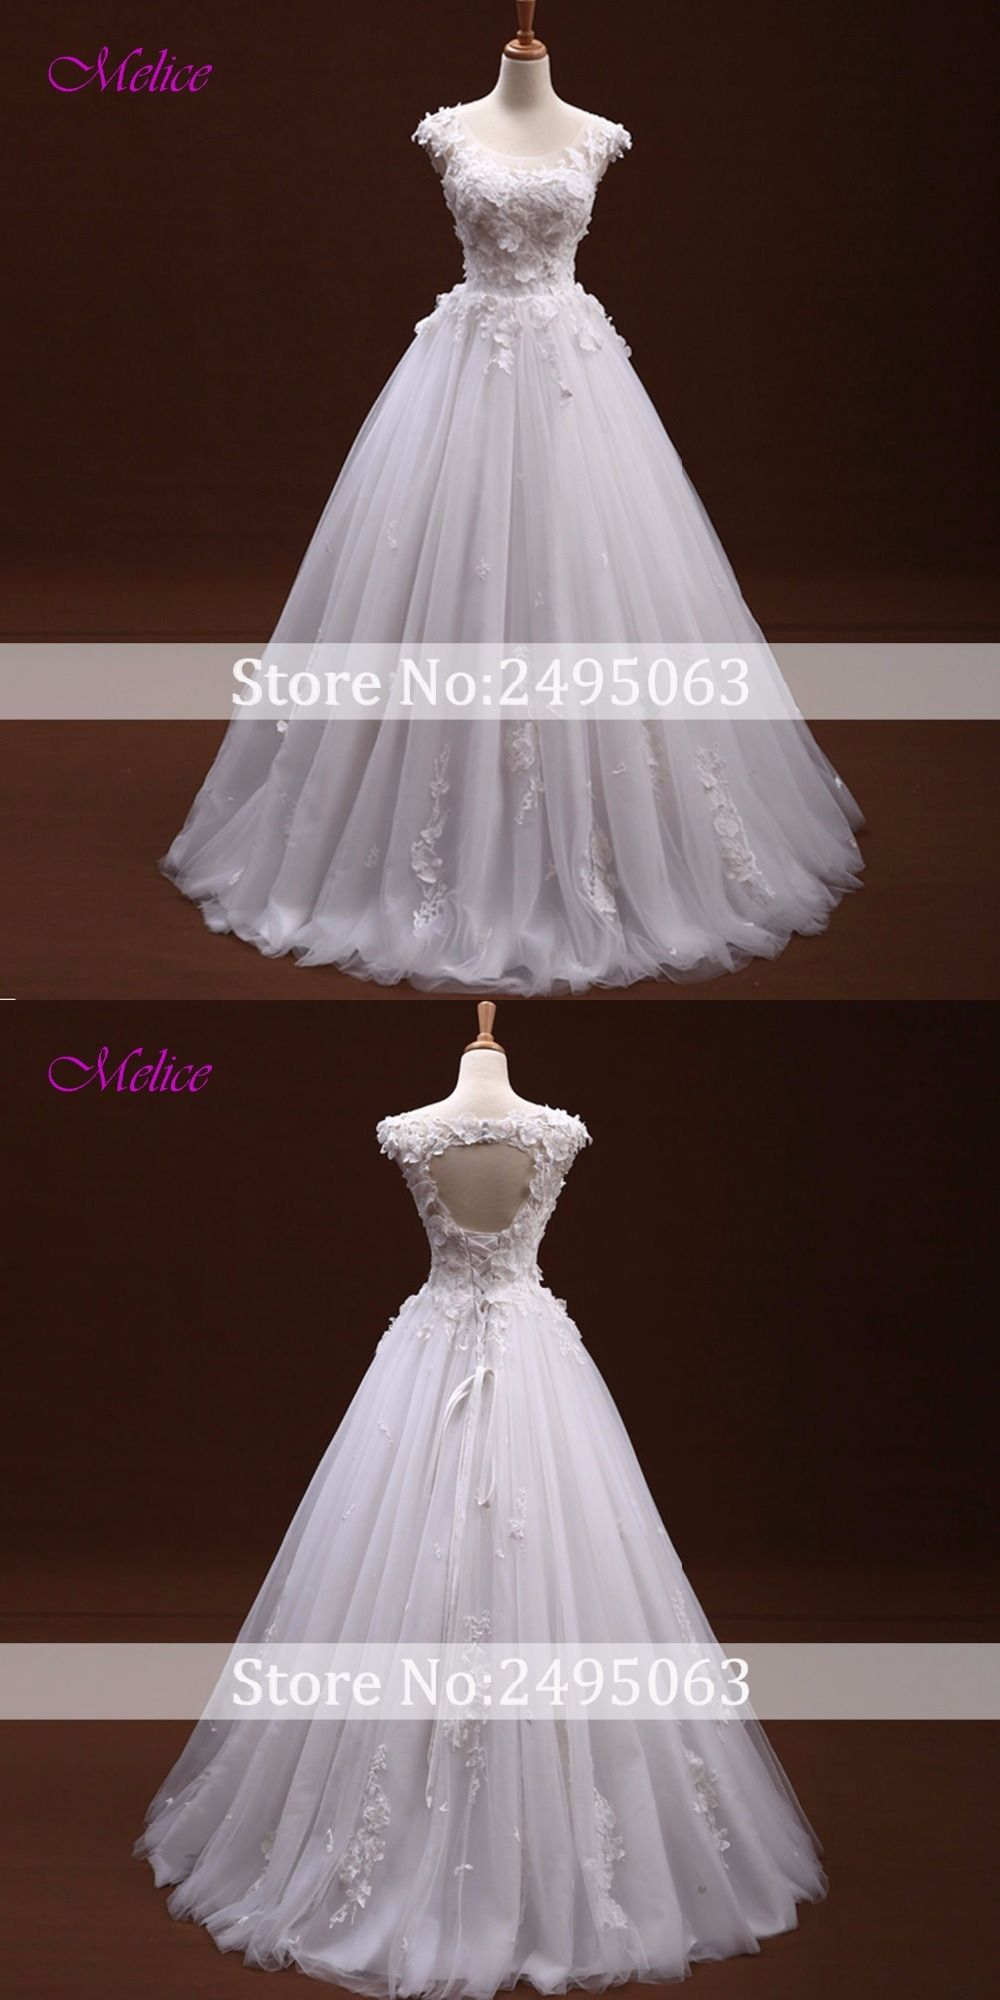 Melice graceful scoop neck lace up aline bohemian wedding dress